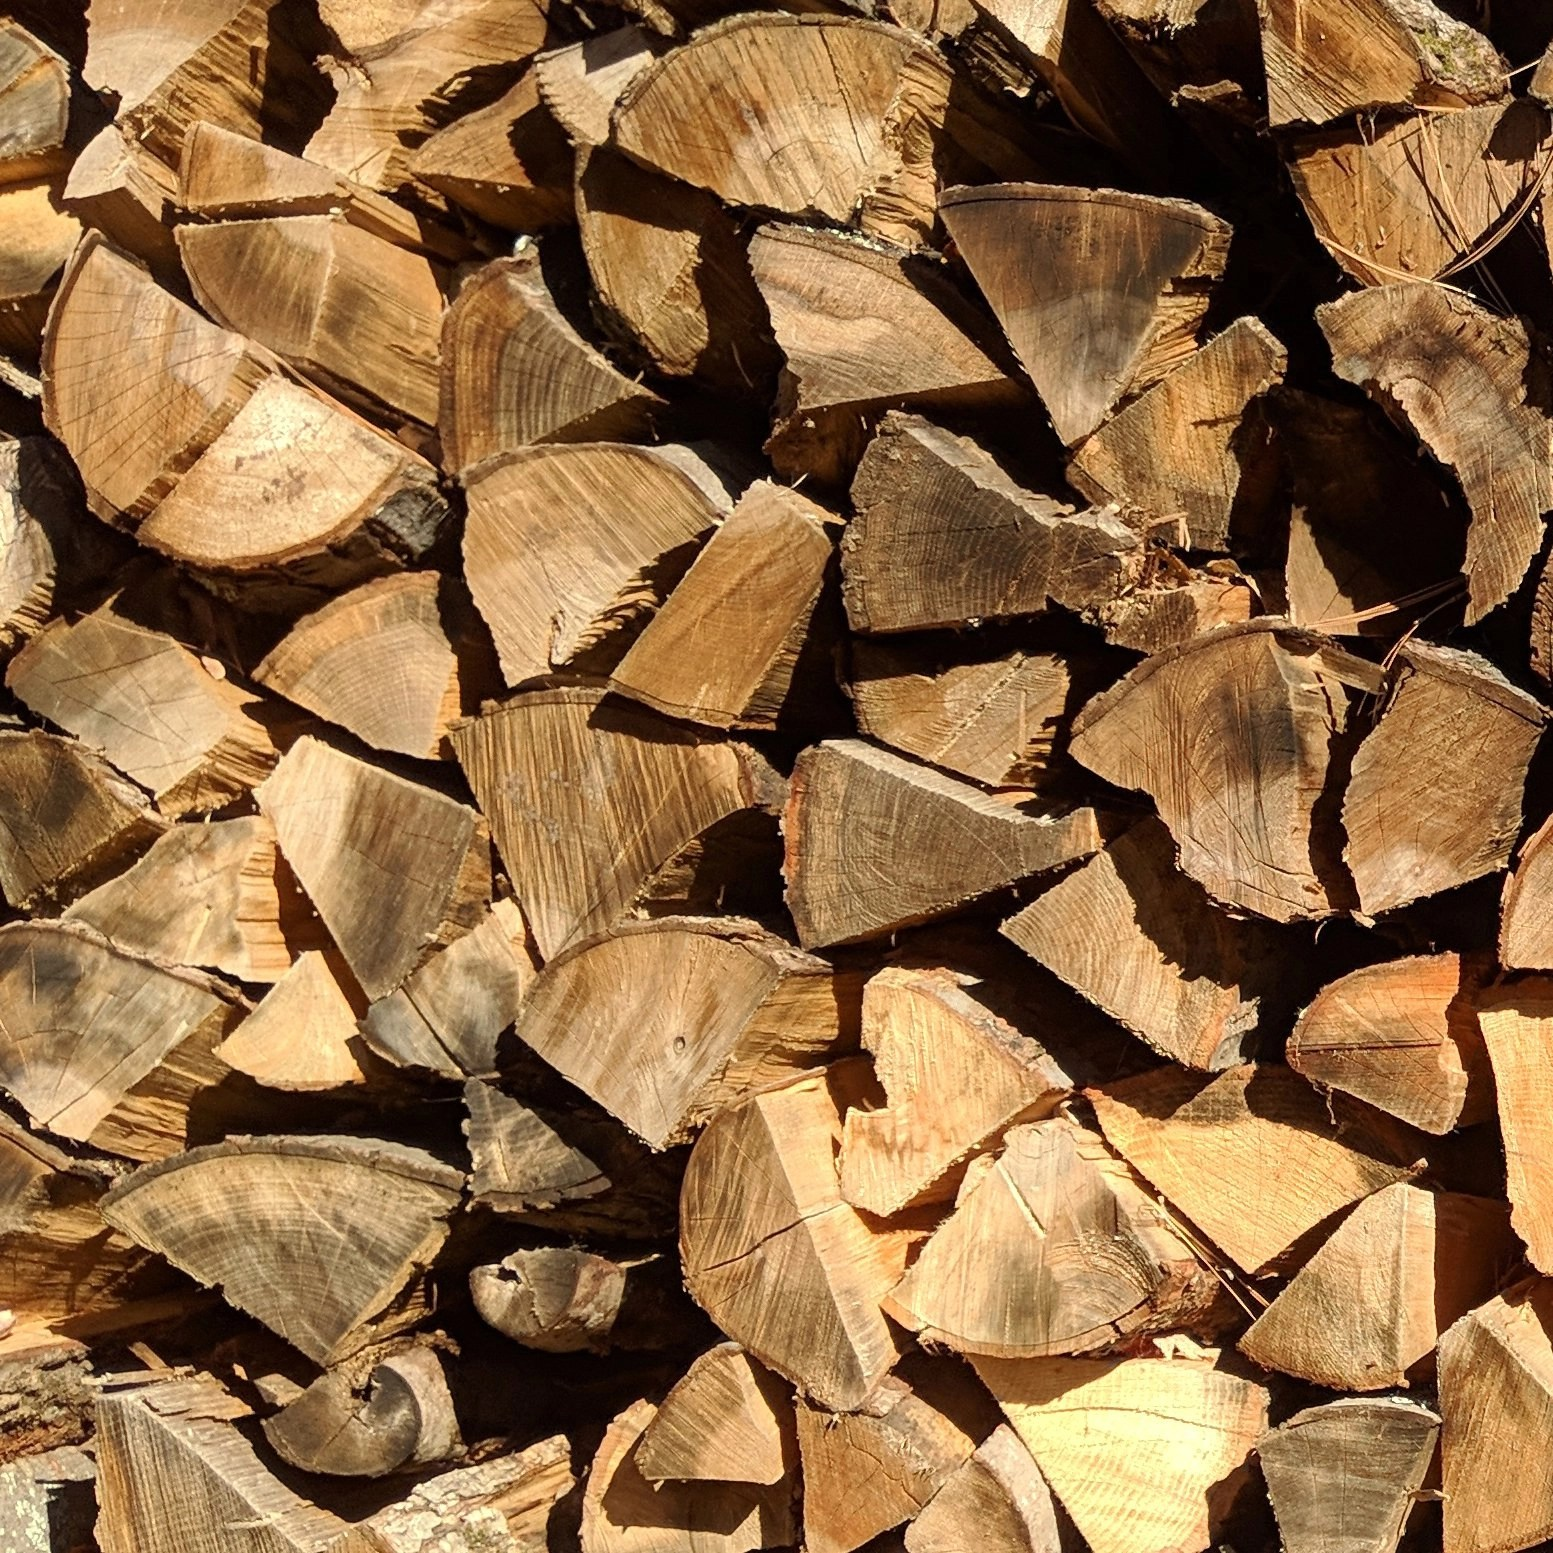 Firewood neatly piled high